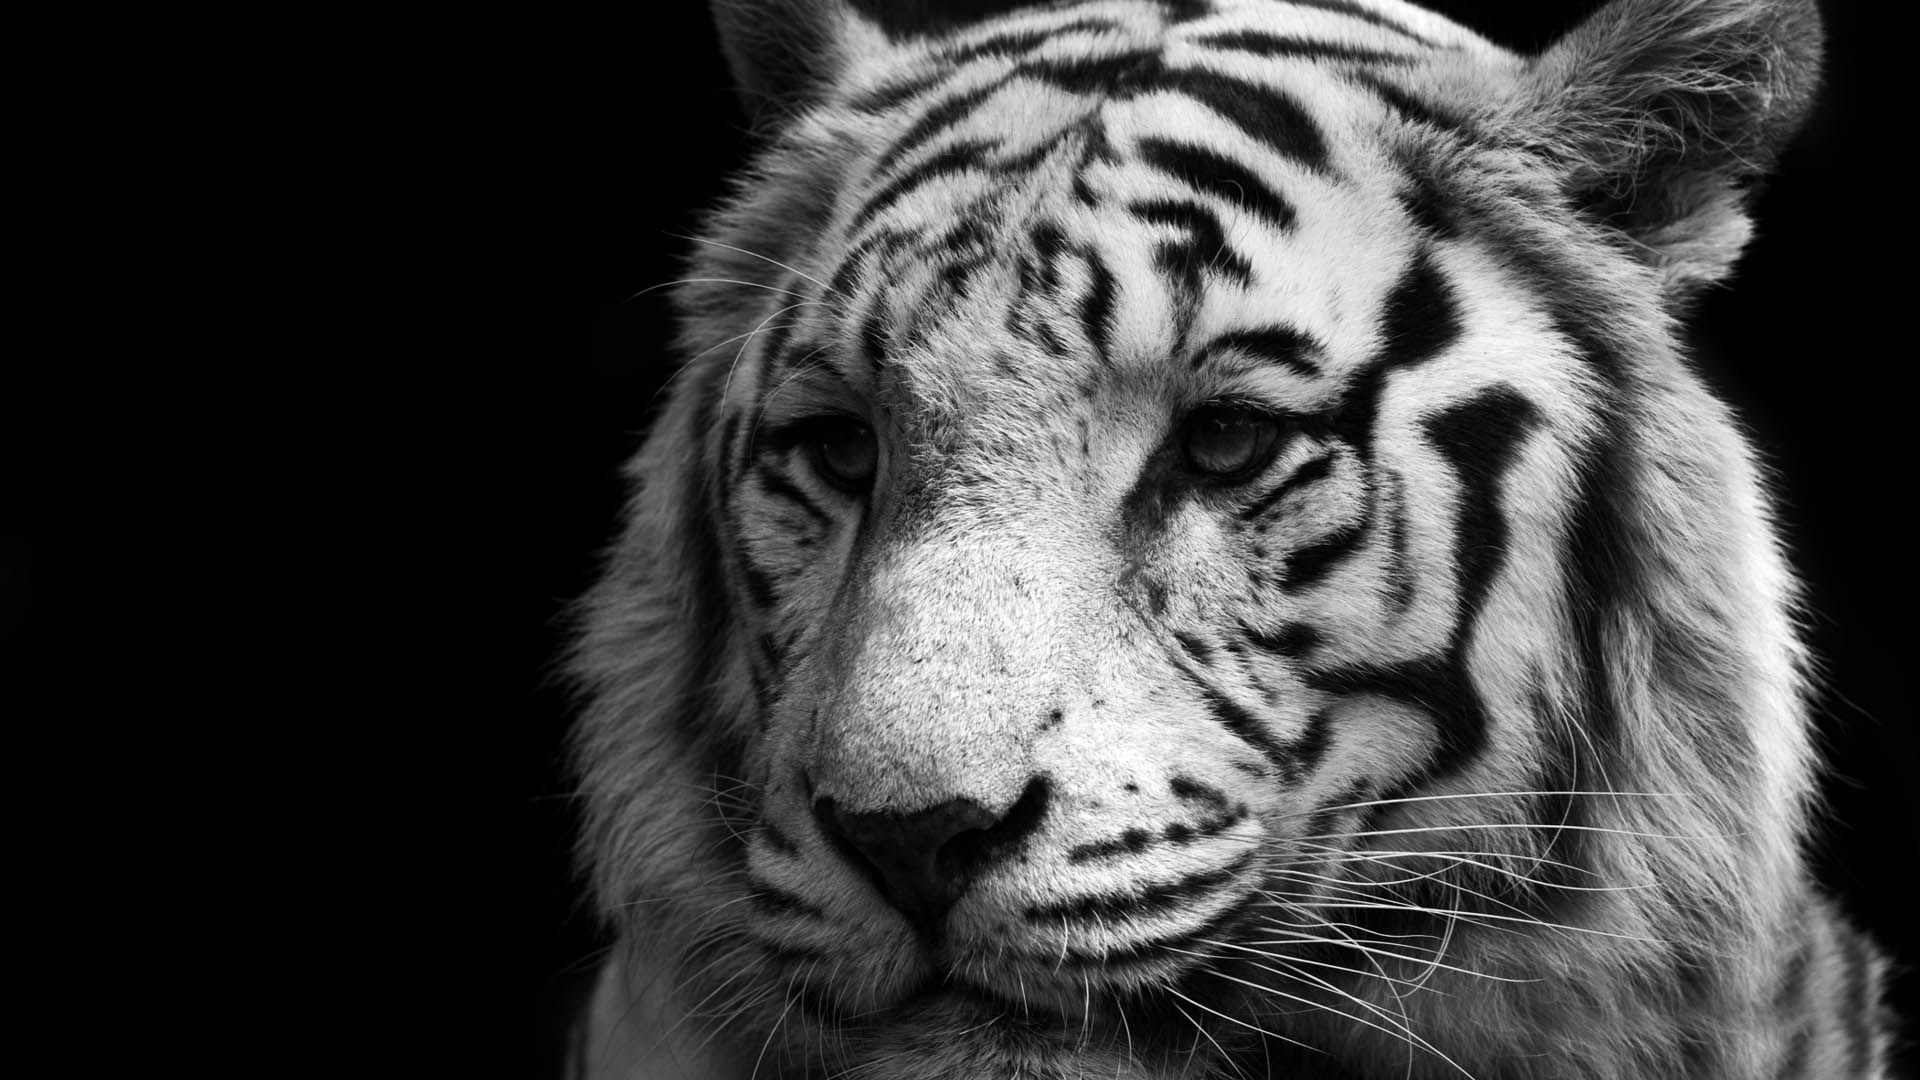 White Tiger Face, Free Desktop Wallpaper